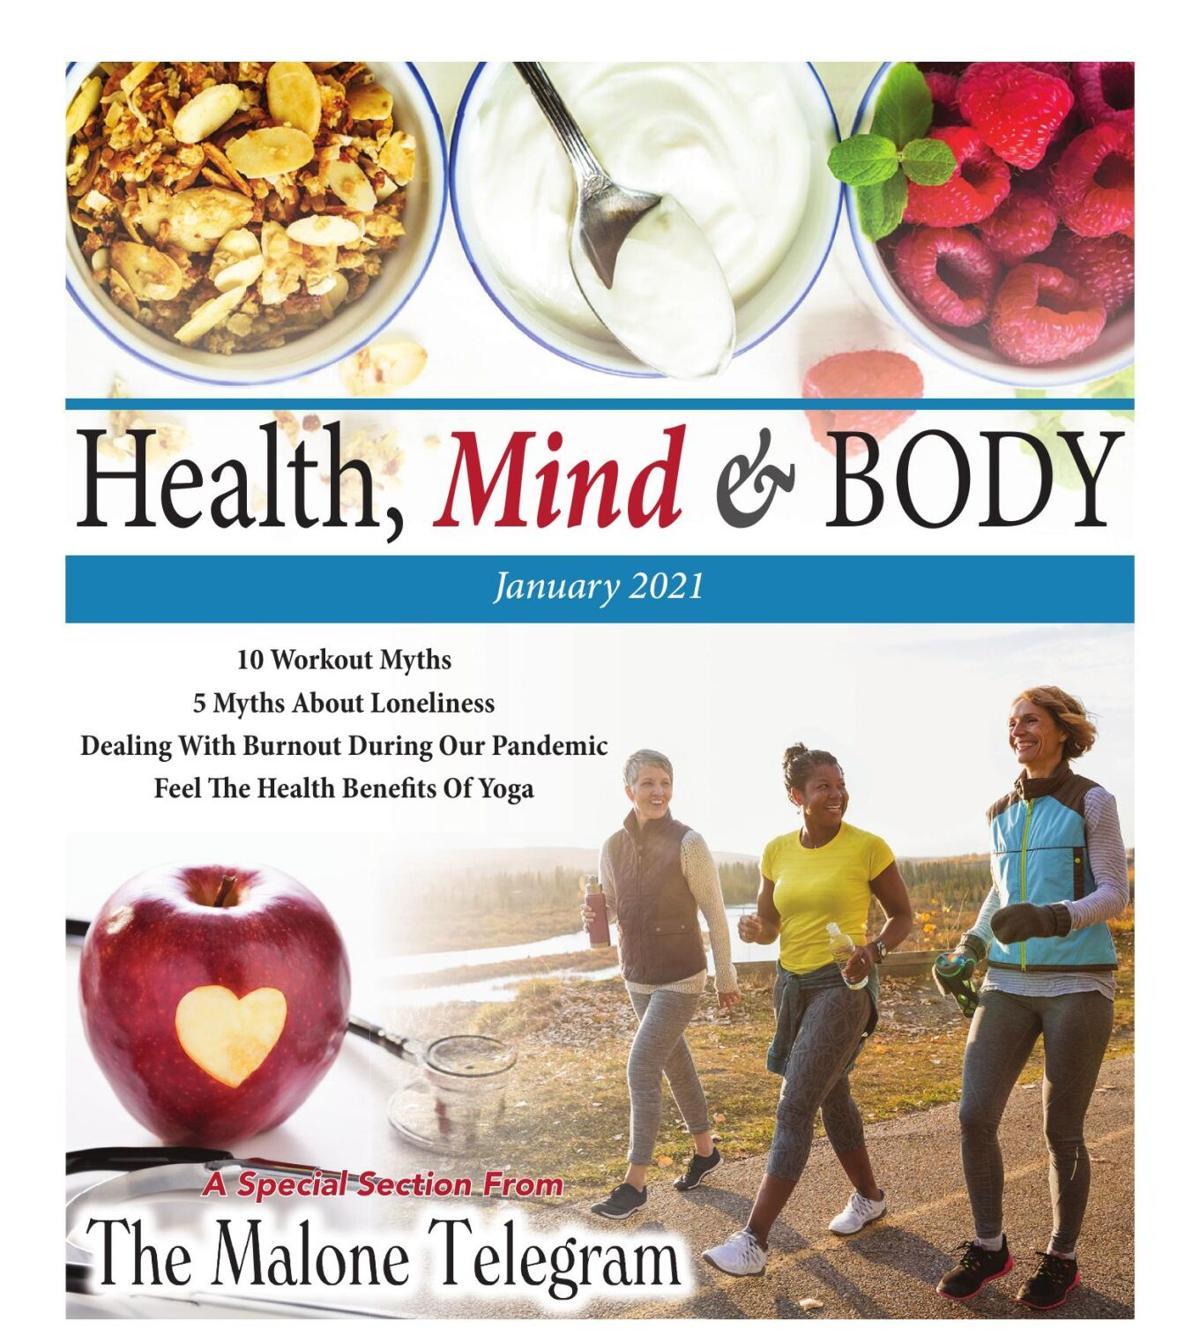 2021 Health, Mind & Body